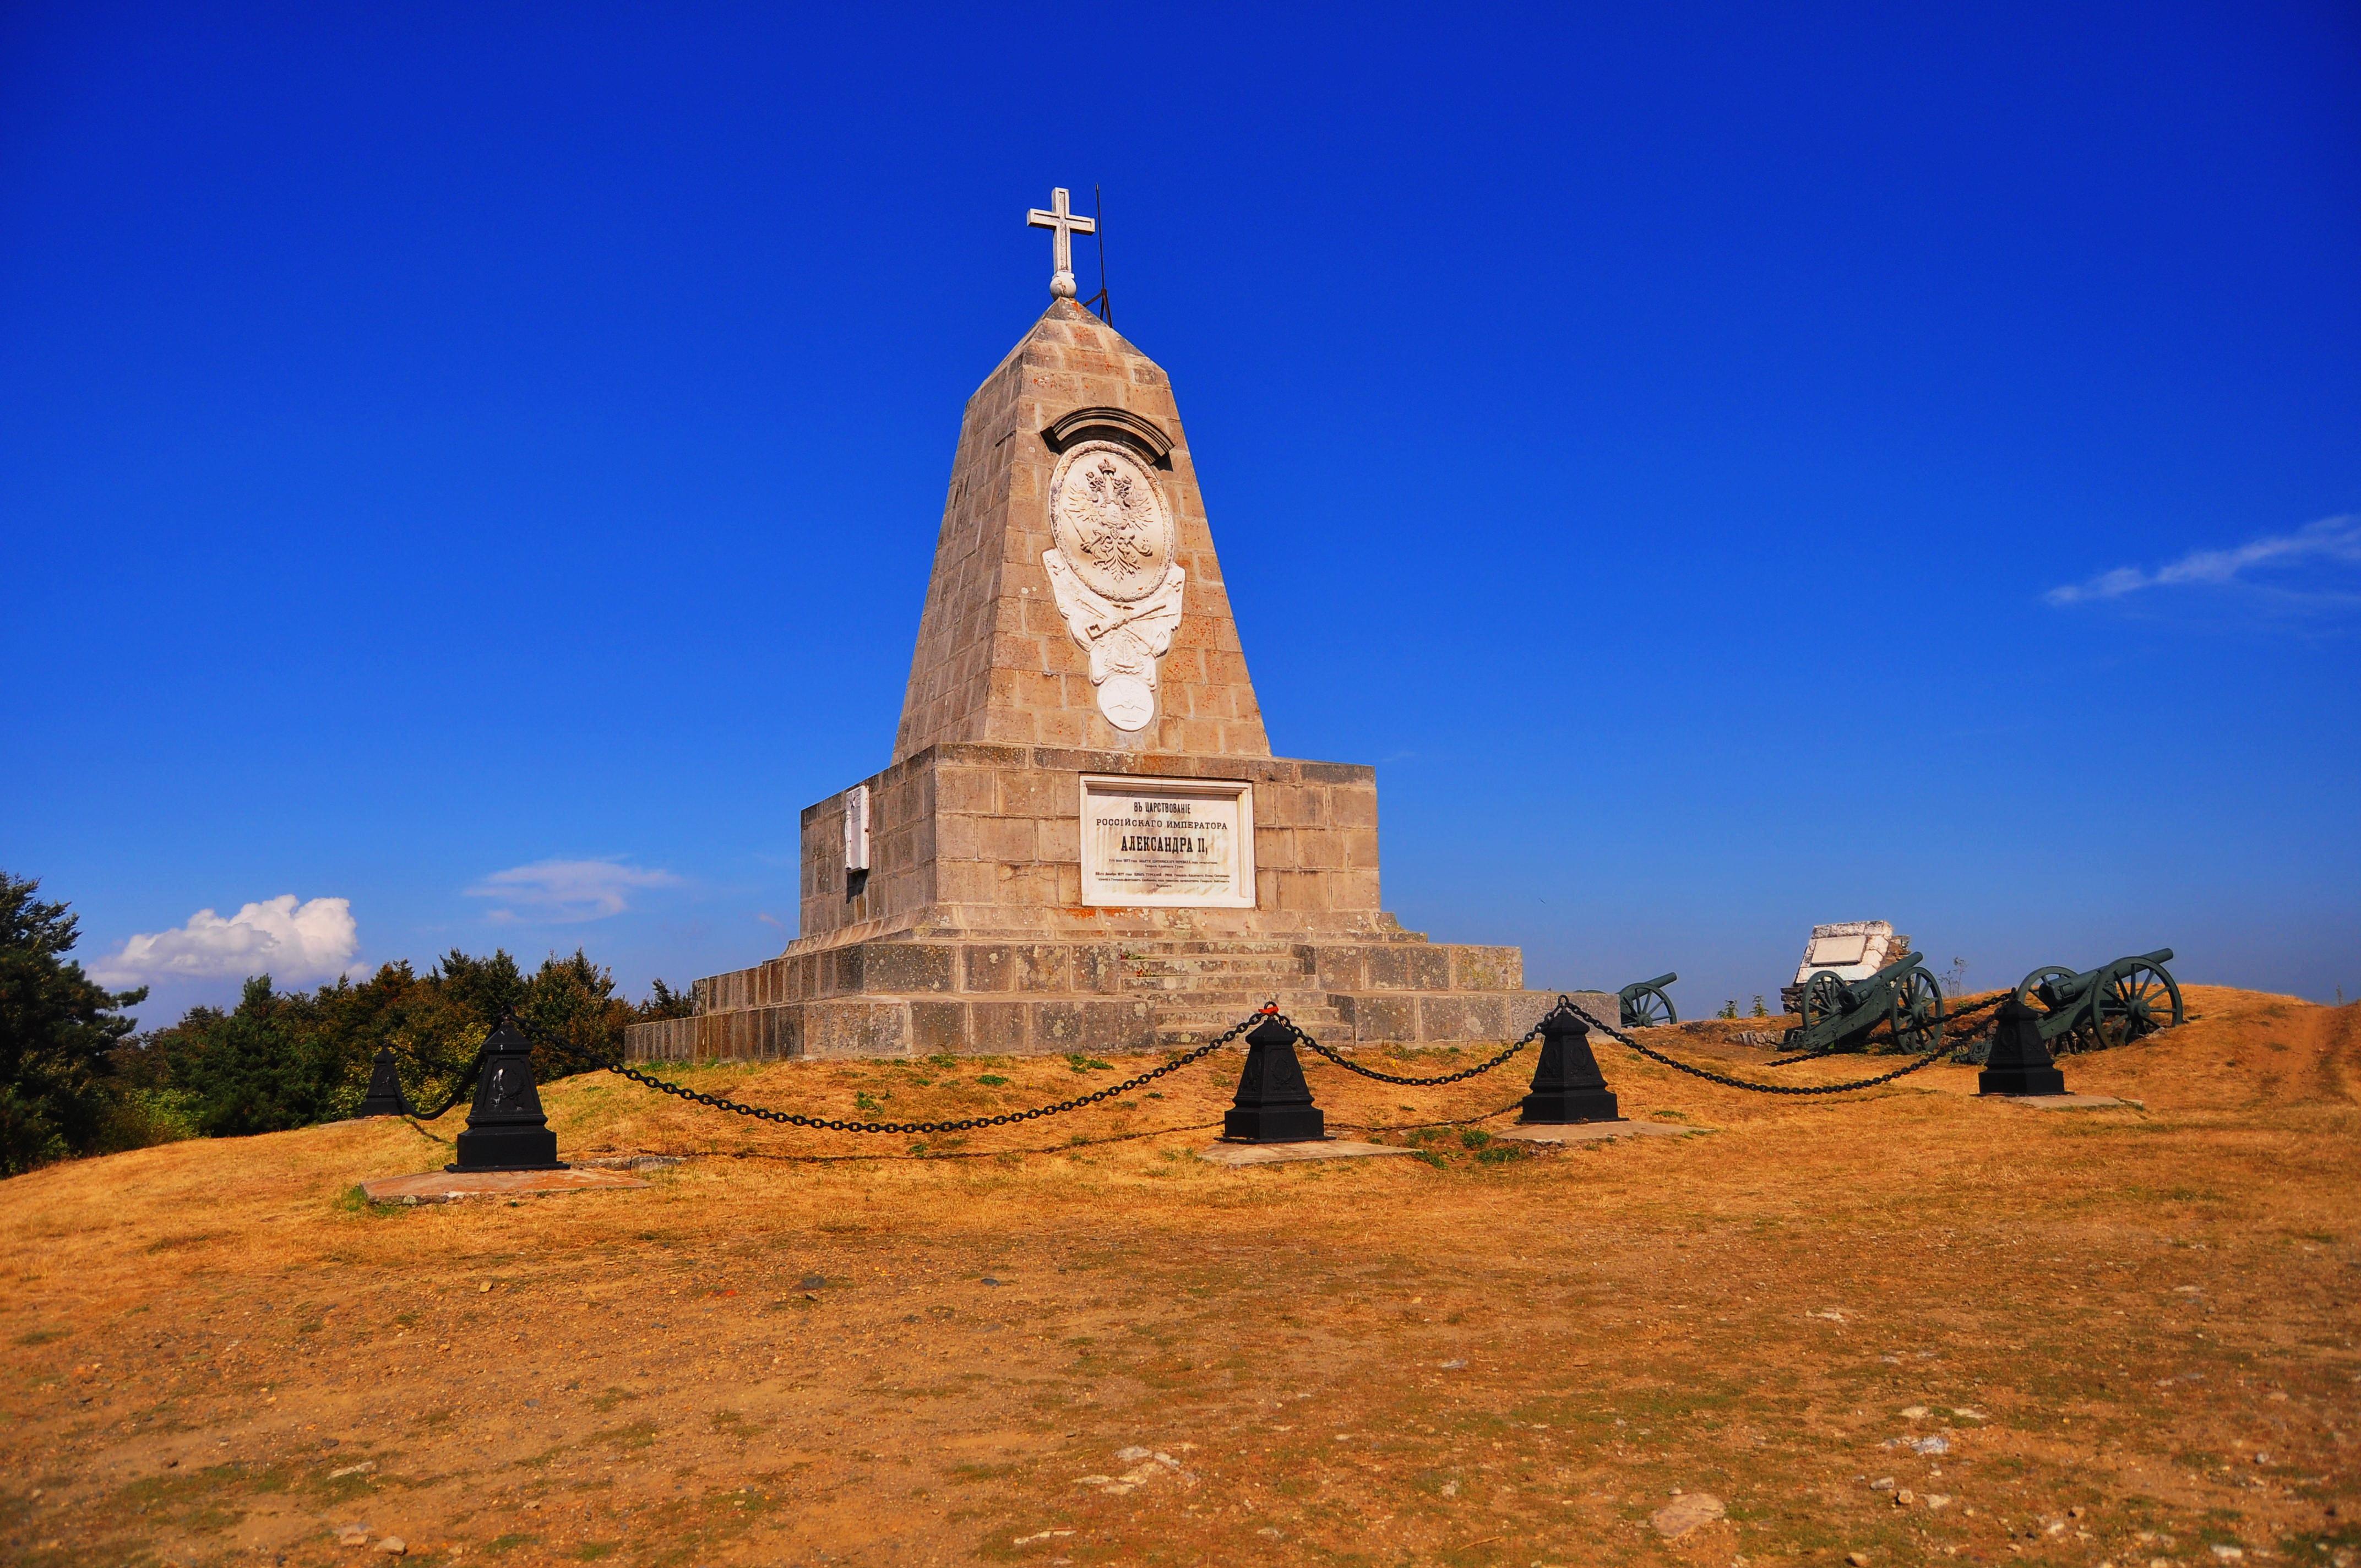 Marele monument rusesc. Shikpa